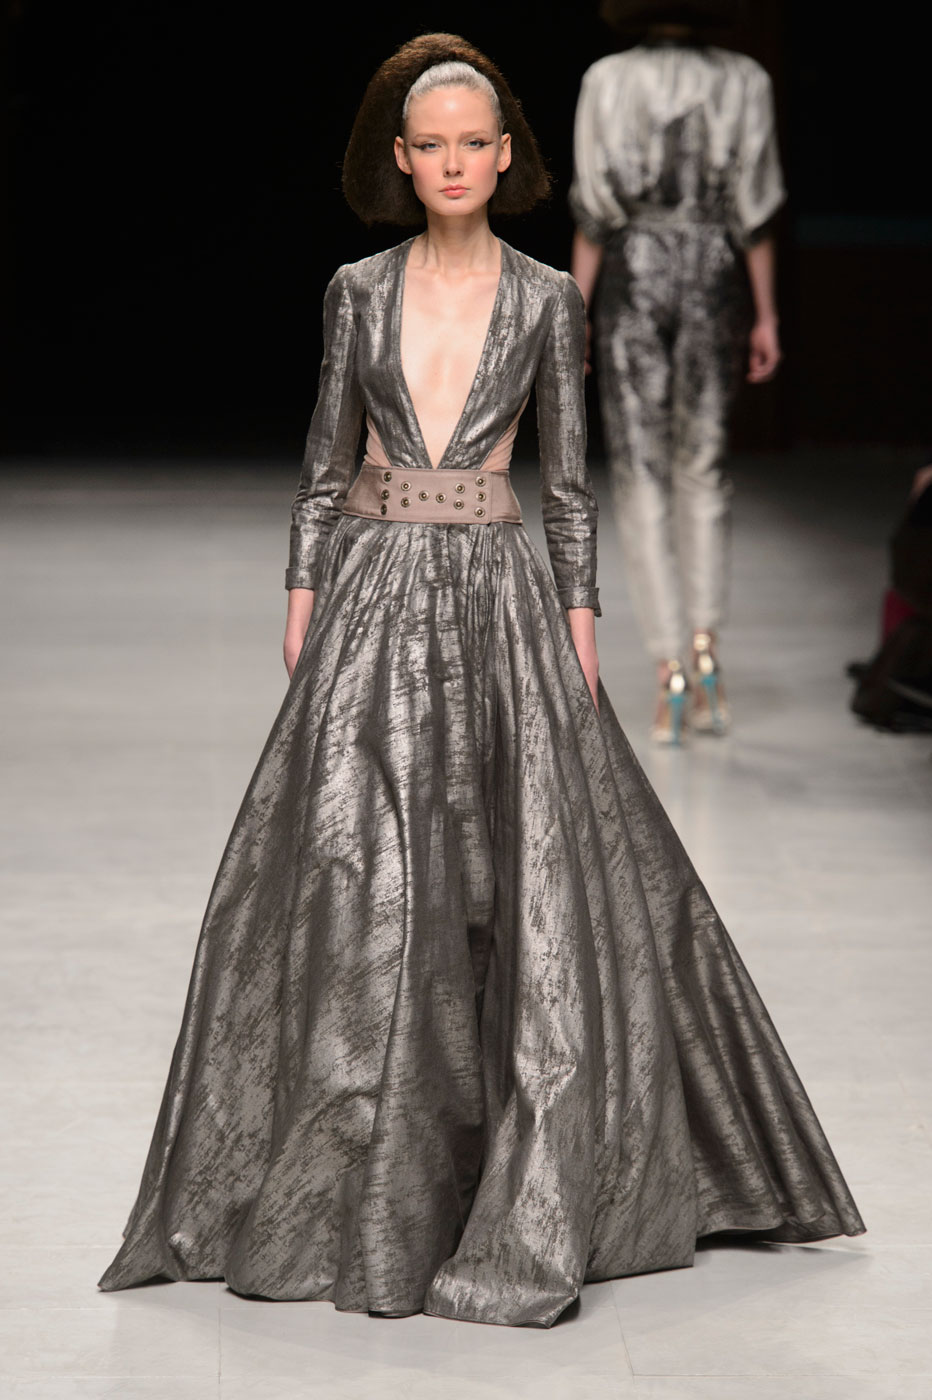 Julien-Fournie-Prive-fashion-runway-show-haute-couture-paris-spring-2015-the-impression-32